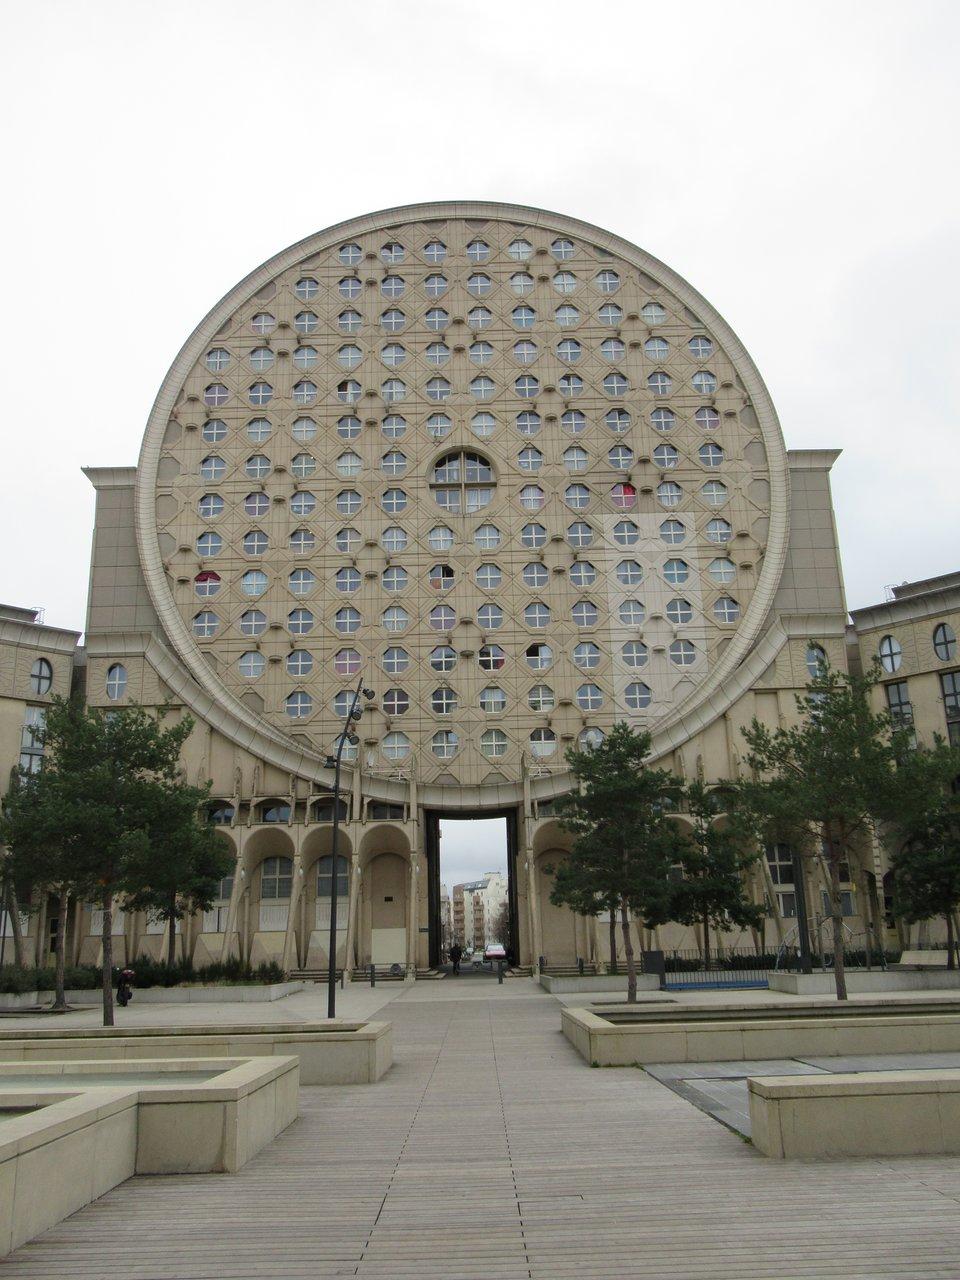 Noisy Le Grand Architecture les arenes de picasso (noisy-le-grand) - 2020 all you need